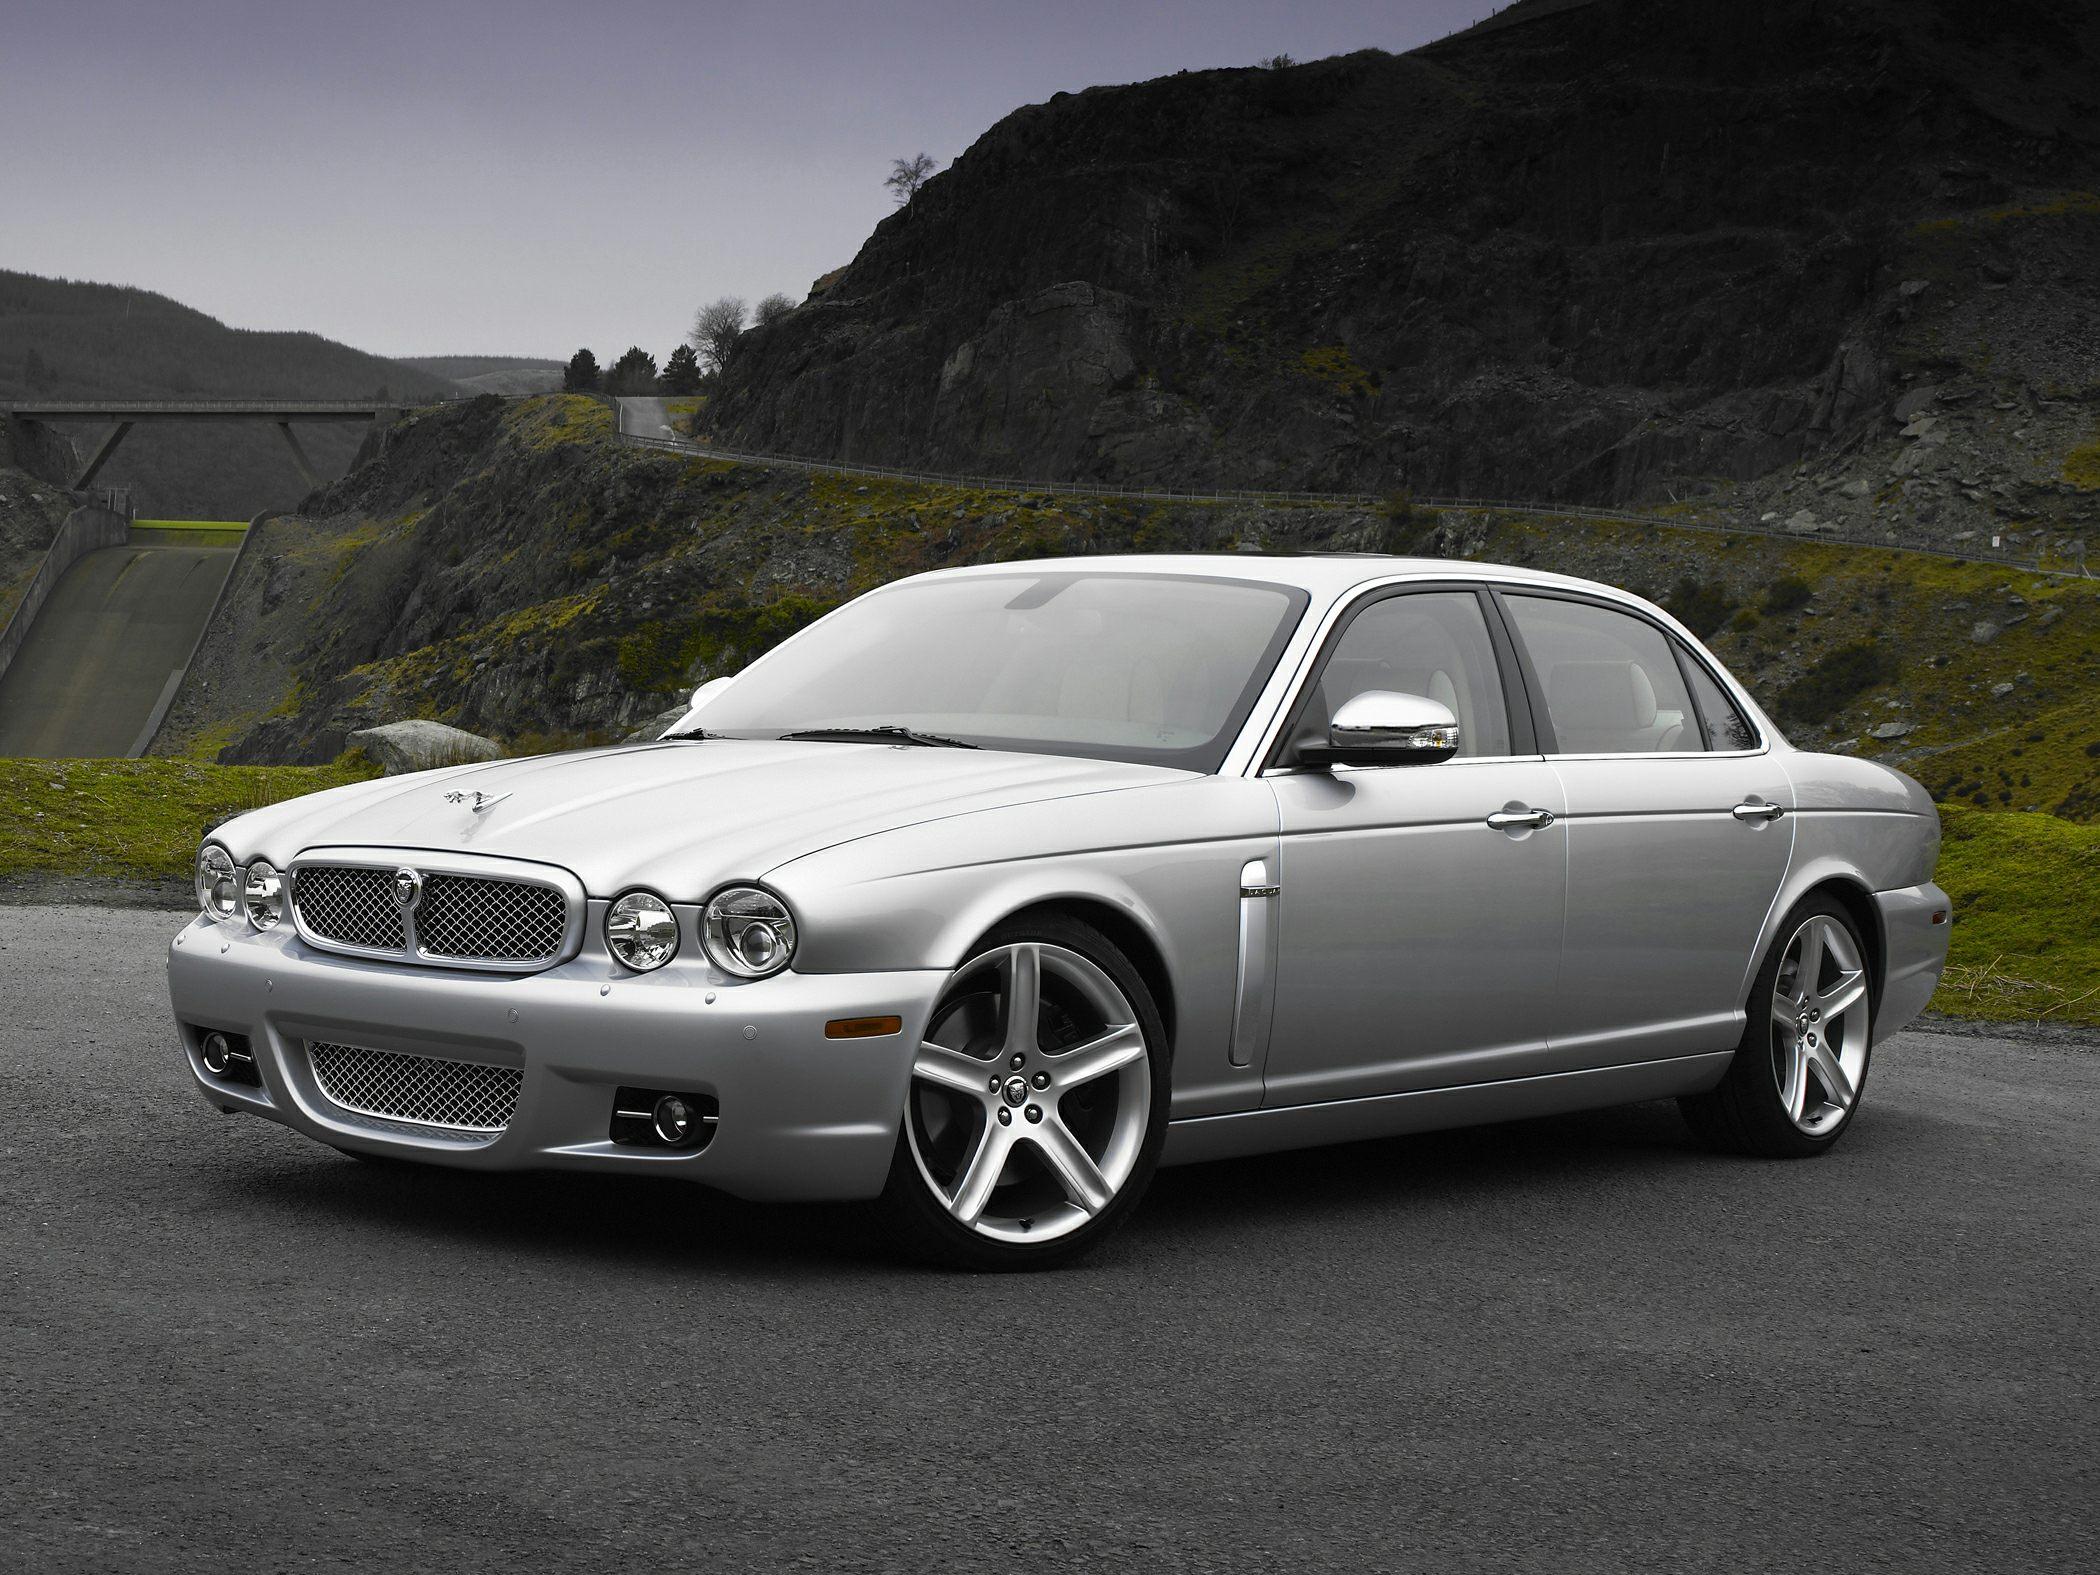 Jaguar Xj8 Sedan Models Price Specs Reviews Cars Com